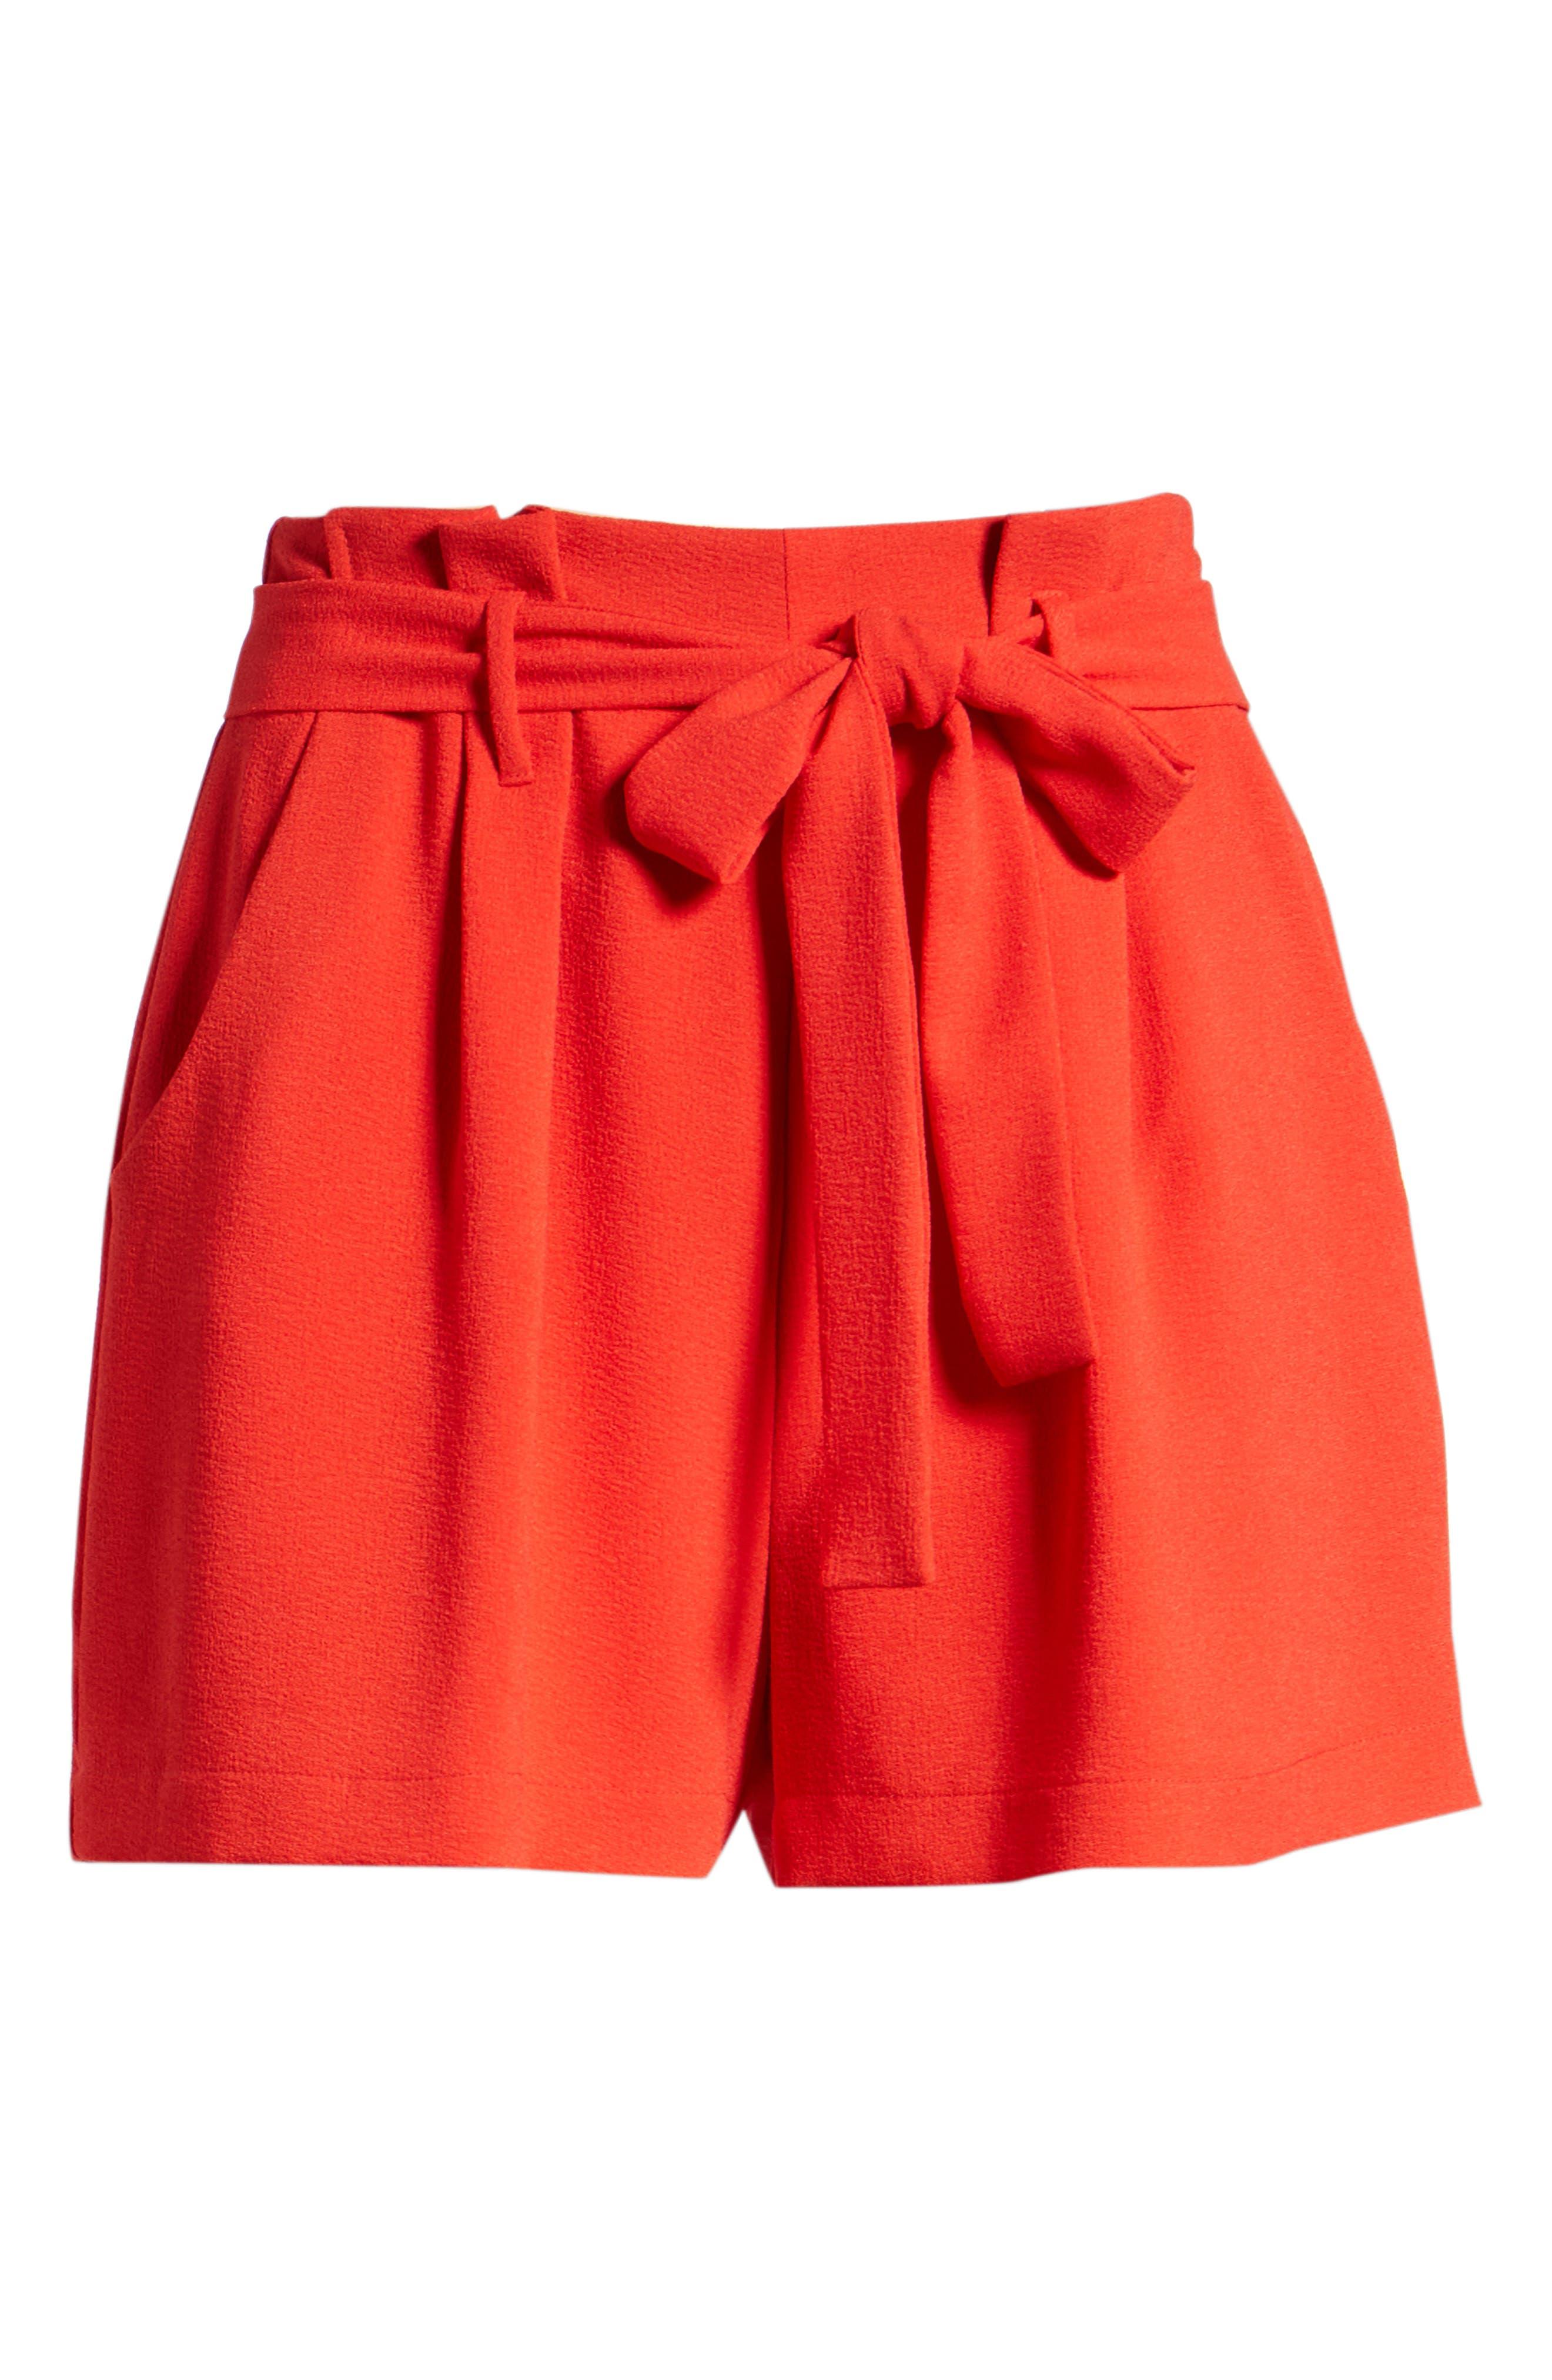 Tie Waist Shorts,                             Alternate thumbnail 6, color,                             RED LIPSTICK